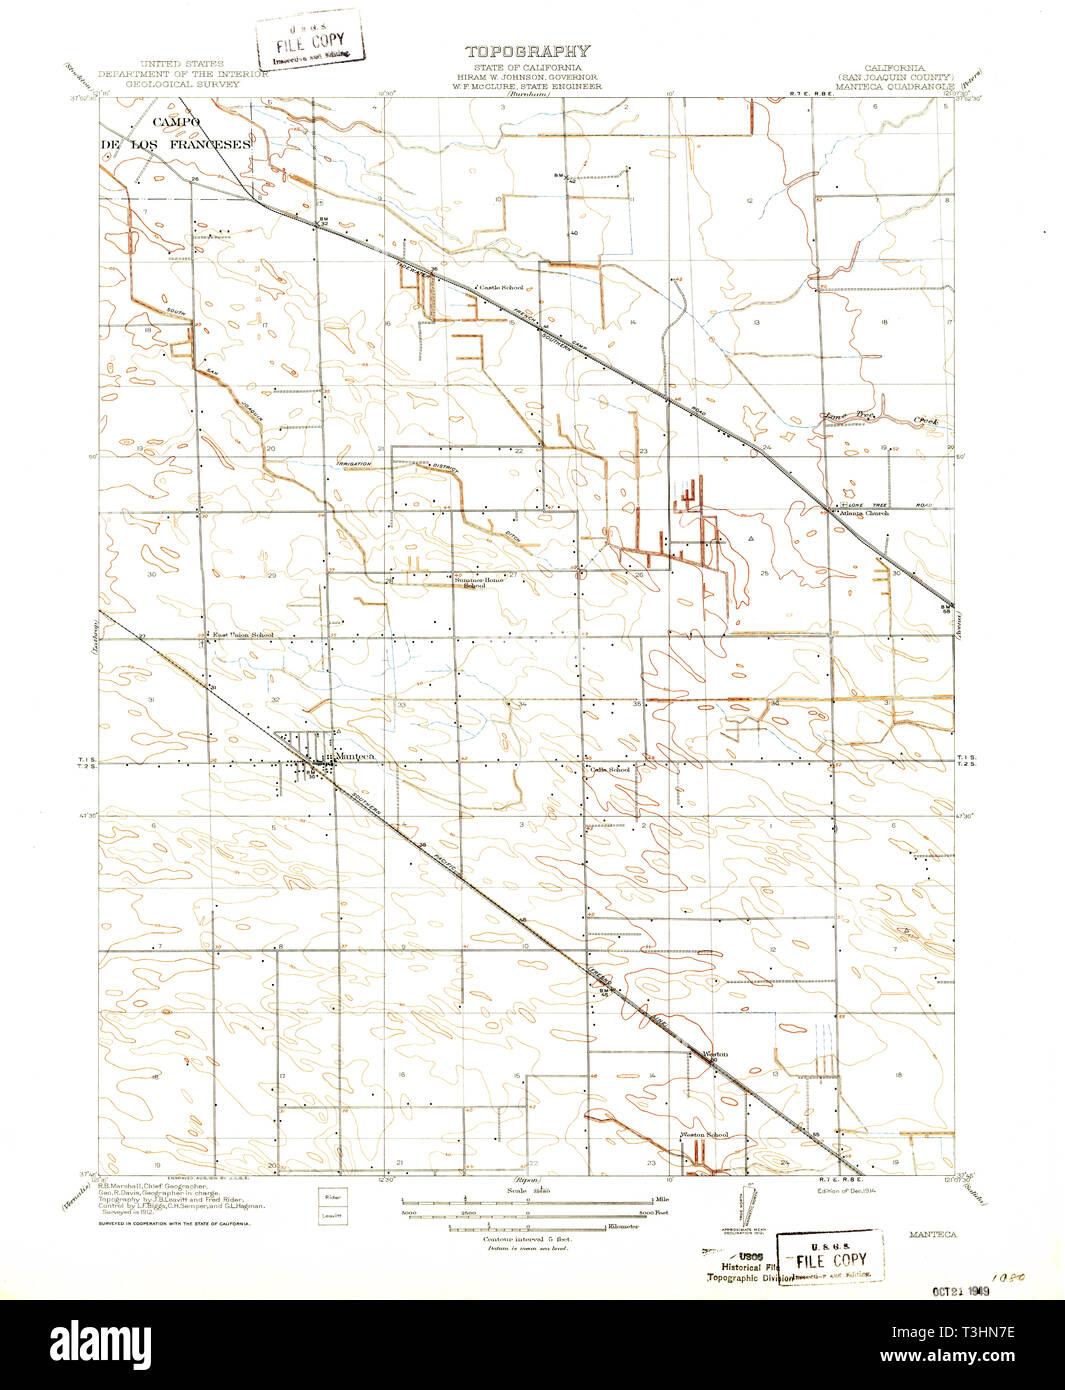 USGS TOPO Map California CA Manteca 296287 1914 31680 ... Manteca Map on stockton map, linden map, sanger map, santee map, escalon map, burney map, colton map, berkeley map, woodlake map, milpitas map, lemoore map, french camp map, garberville map, marina map, brentwood map, fullerton map, port costa map, patterson map, avenal map, oakdale map,